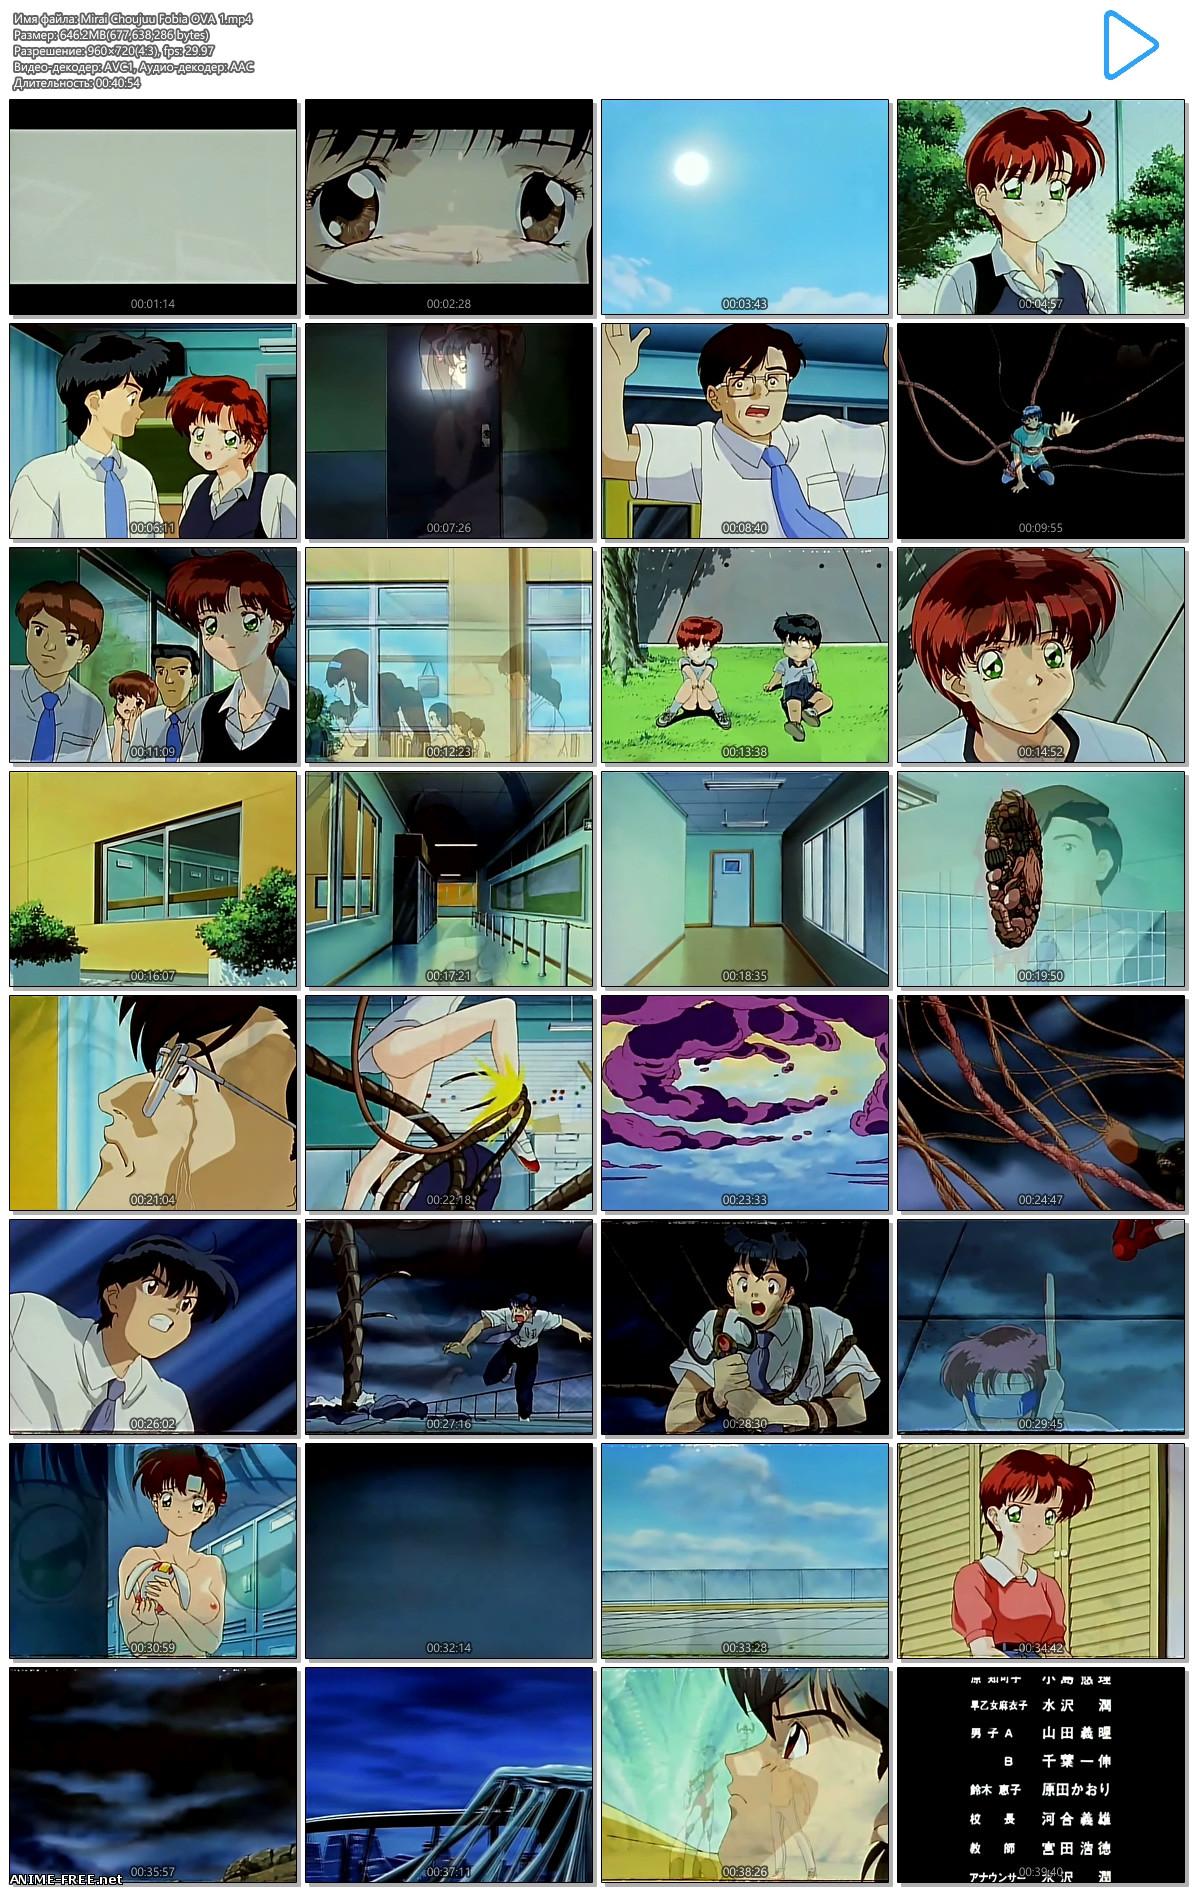 Mirai Choujuu Fobia / Фобия [Ep.1-2] [ENG,JAP,RUS] [720p] Anime Hentai